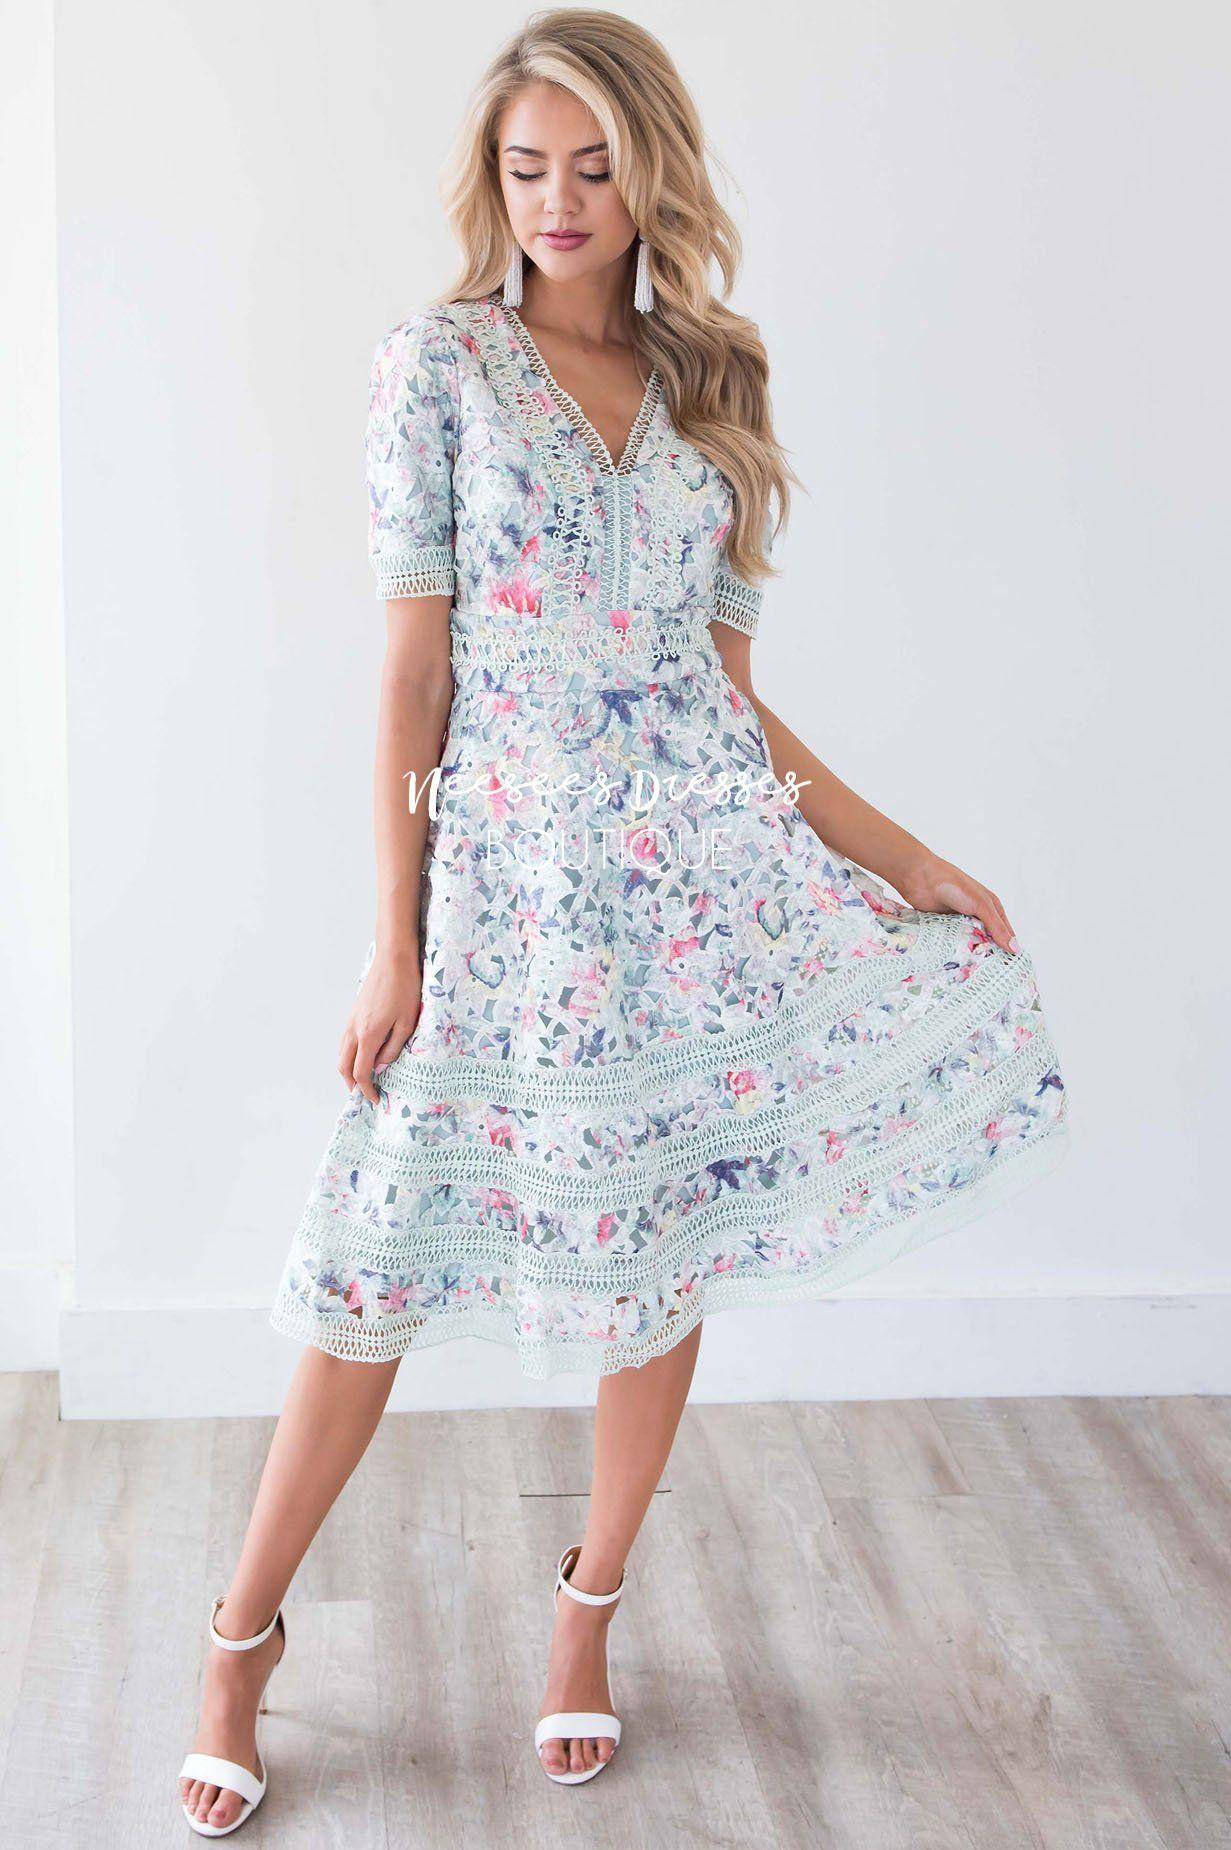 The Adalynne Modest Dresses Classy Dress Neesees Dresses [ 1850 x 1231 Pixel ]